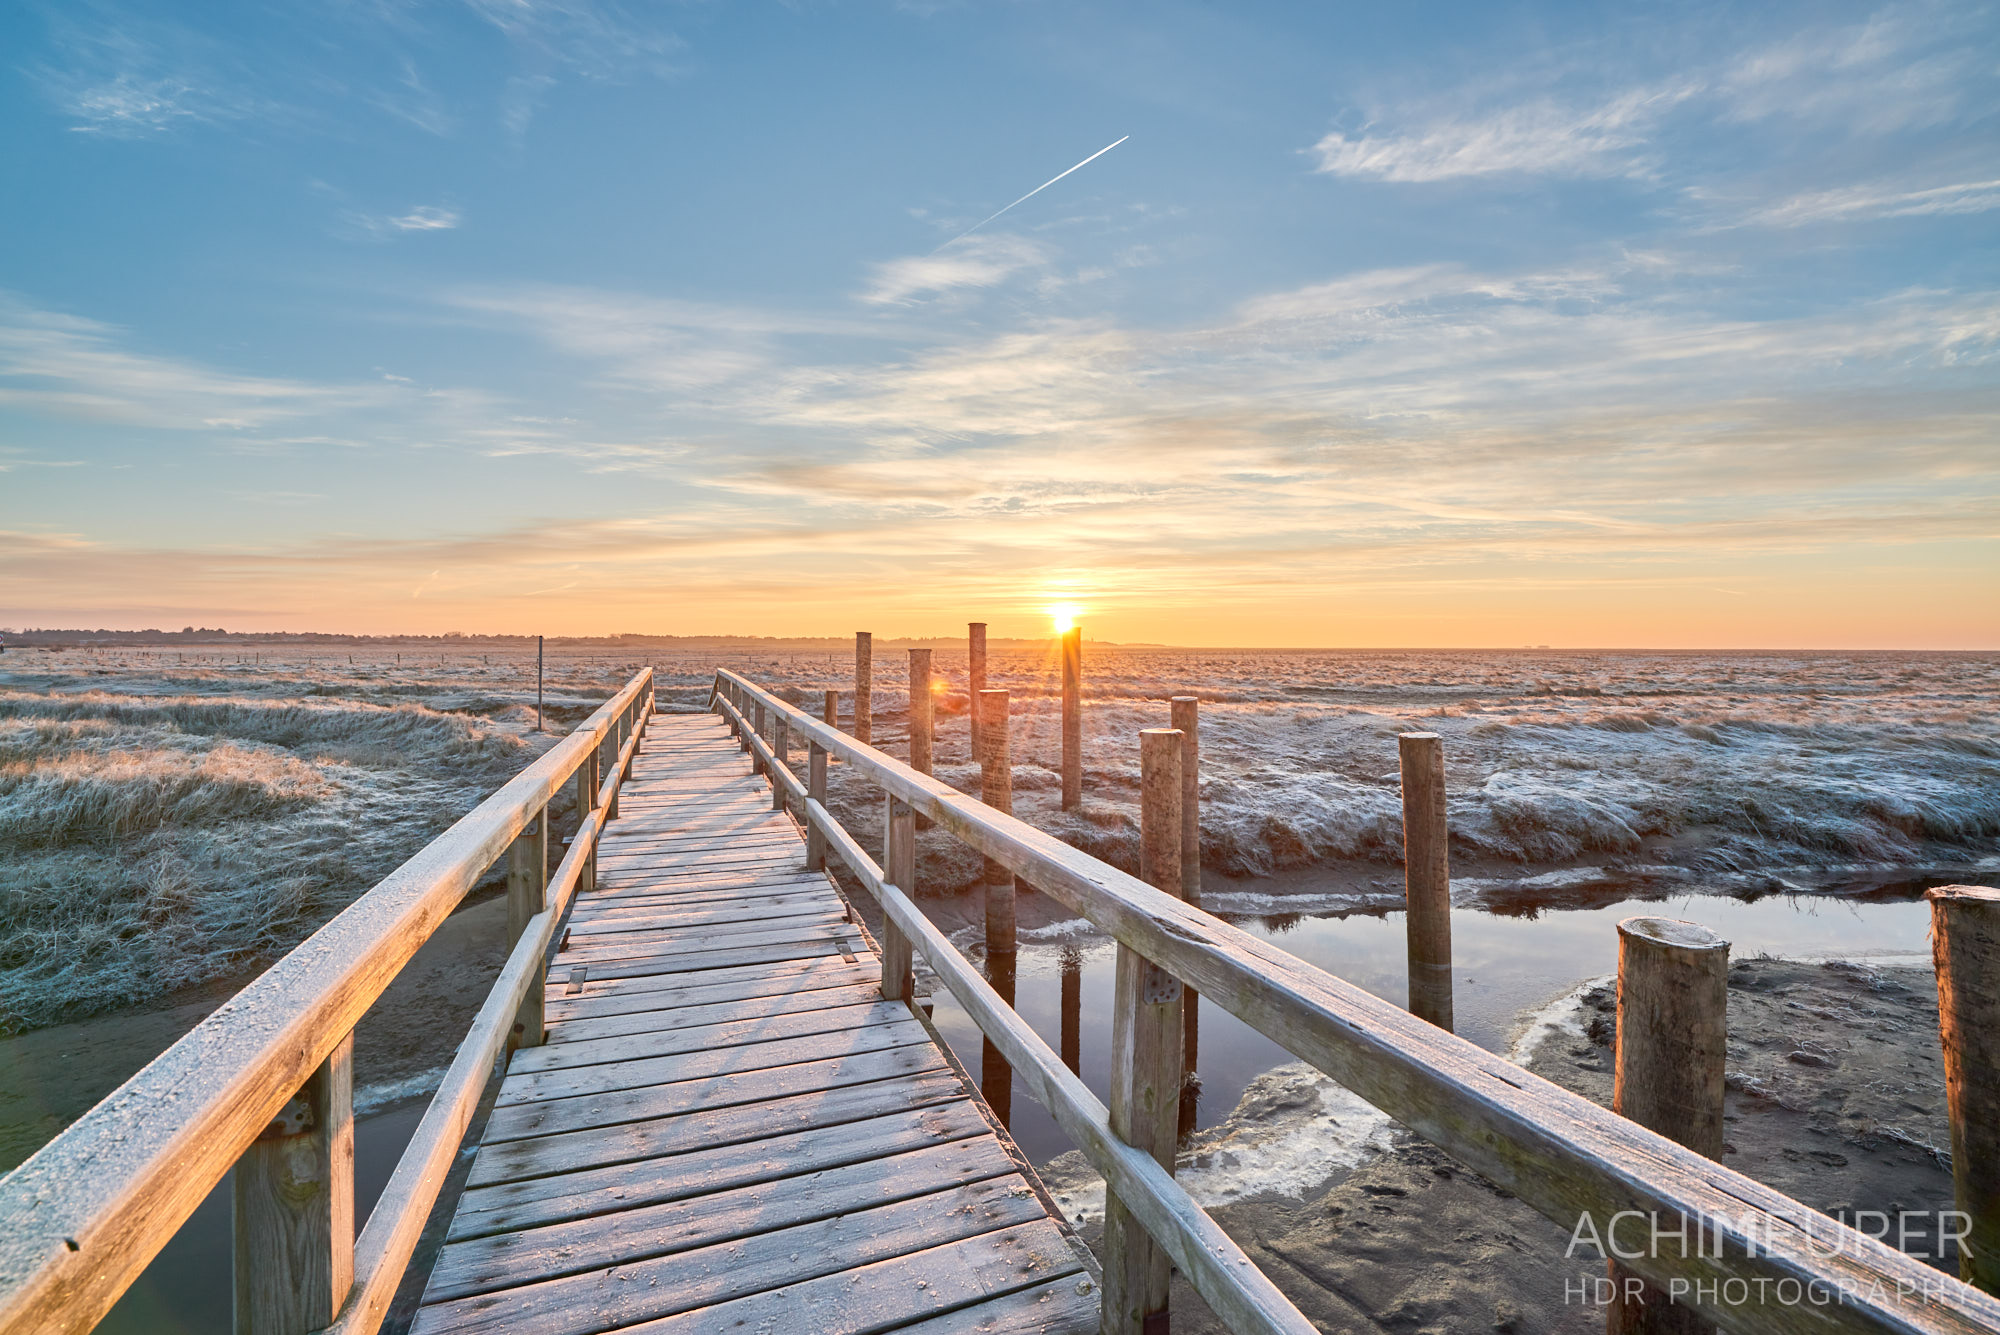 Sonnenaufgang im Vorland an der Nordseeküste in Sankt Peter-Ording by AchimMeurer.com.